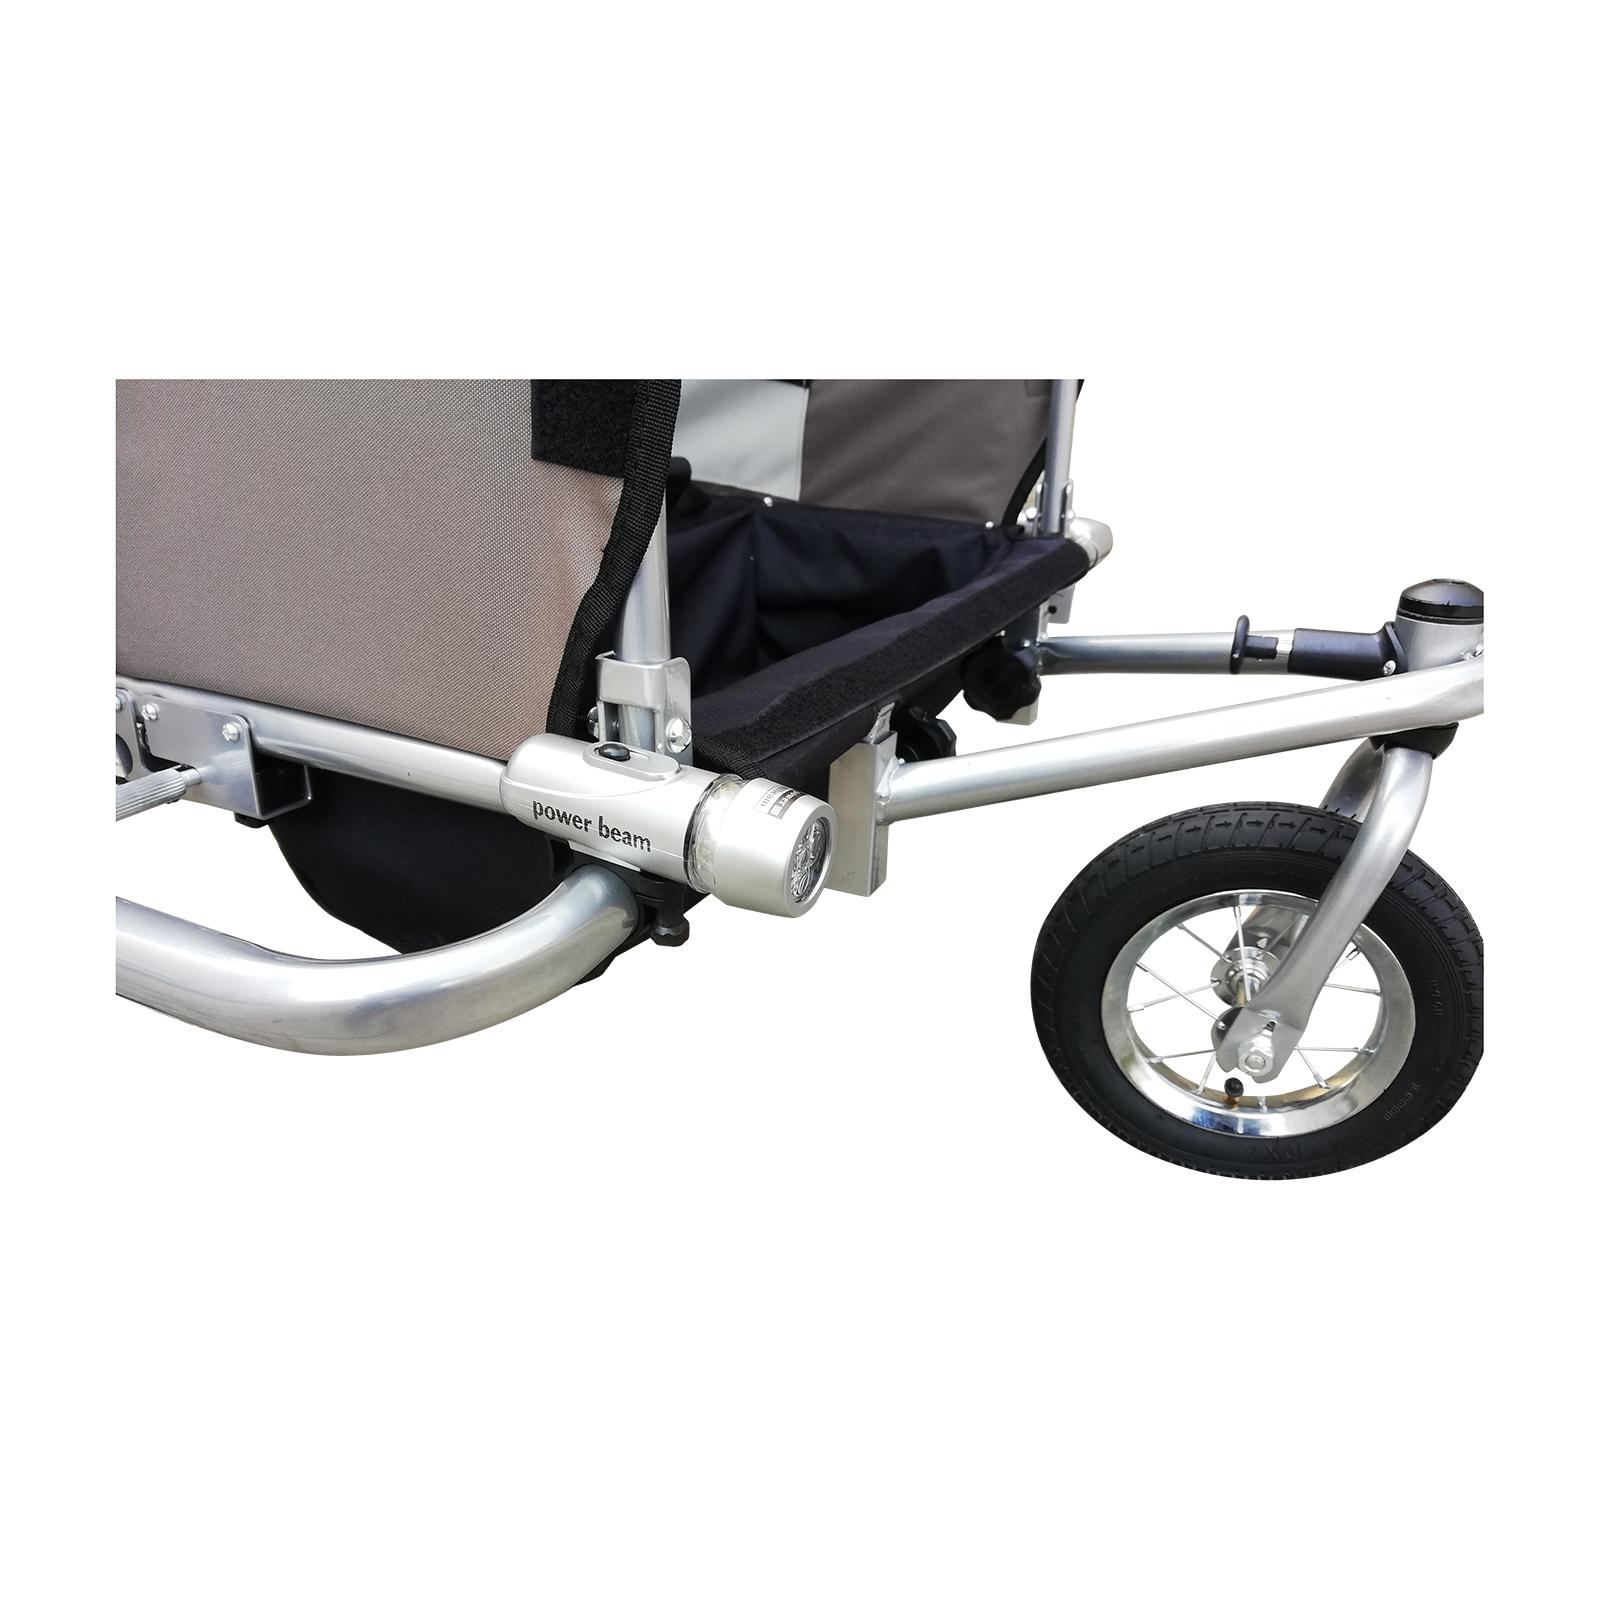 Remolque-Infantil-Bicicleta-2-PLAZAS-Kit-Footing-Rueda-360-Amortiguadores-Barra miniatura 19